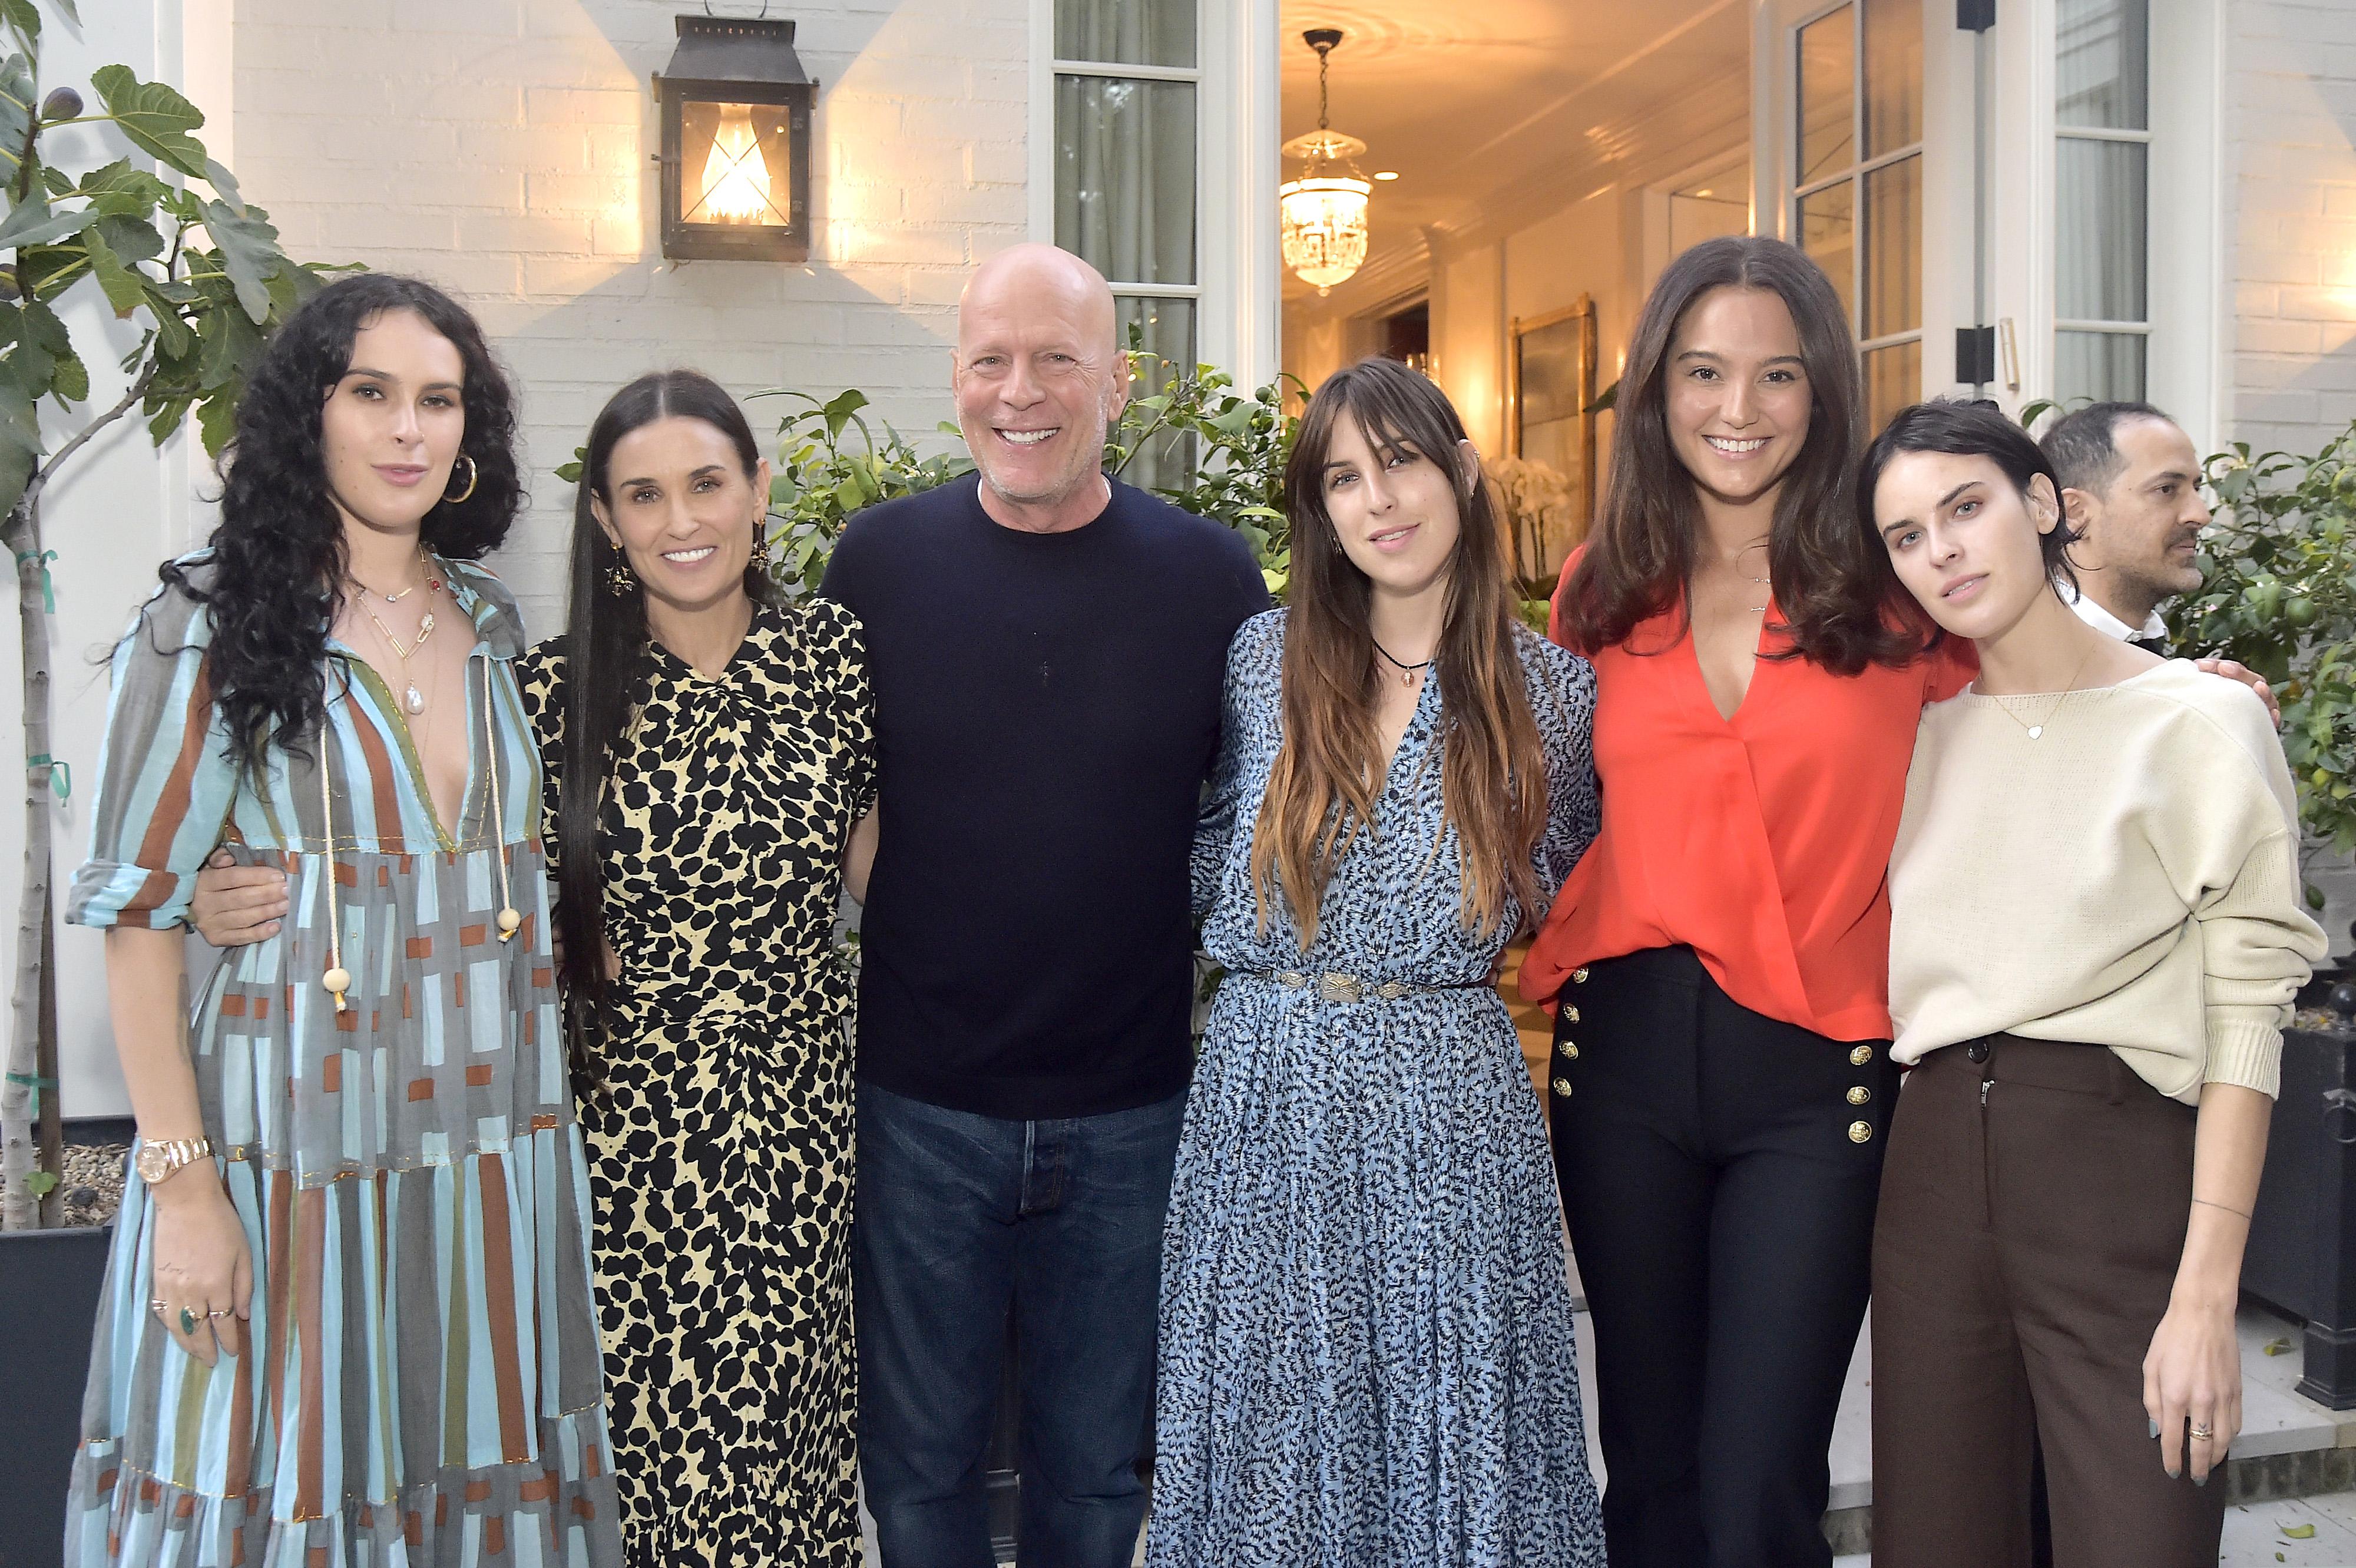 Rumer Willis, Demi Moore, Bruce Willis, Scout Willis, Emma Heming, Tallulah Willis